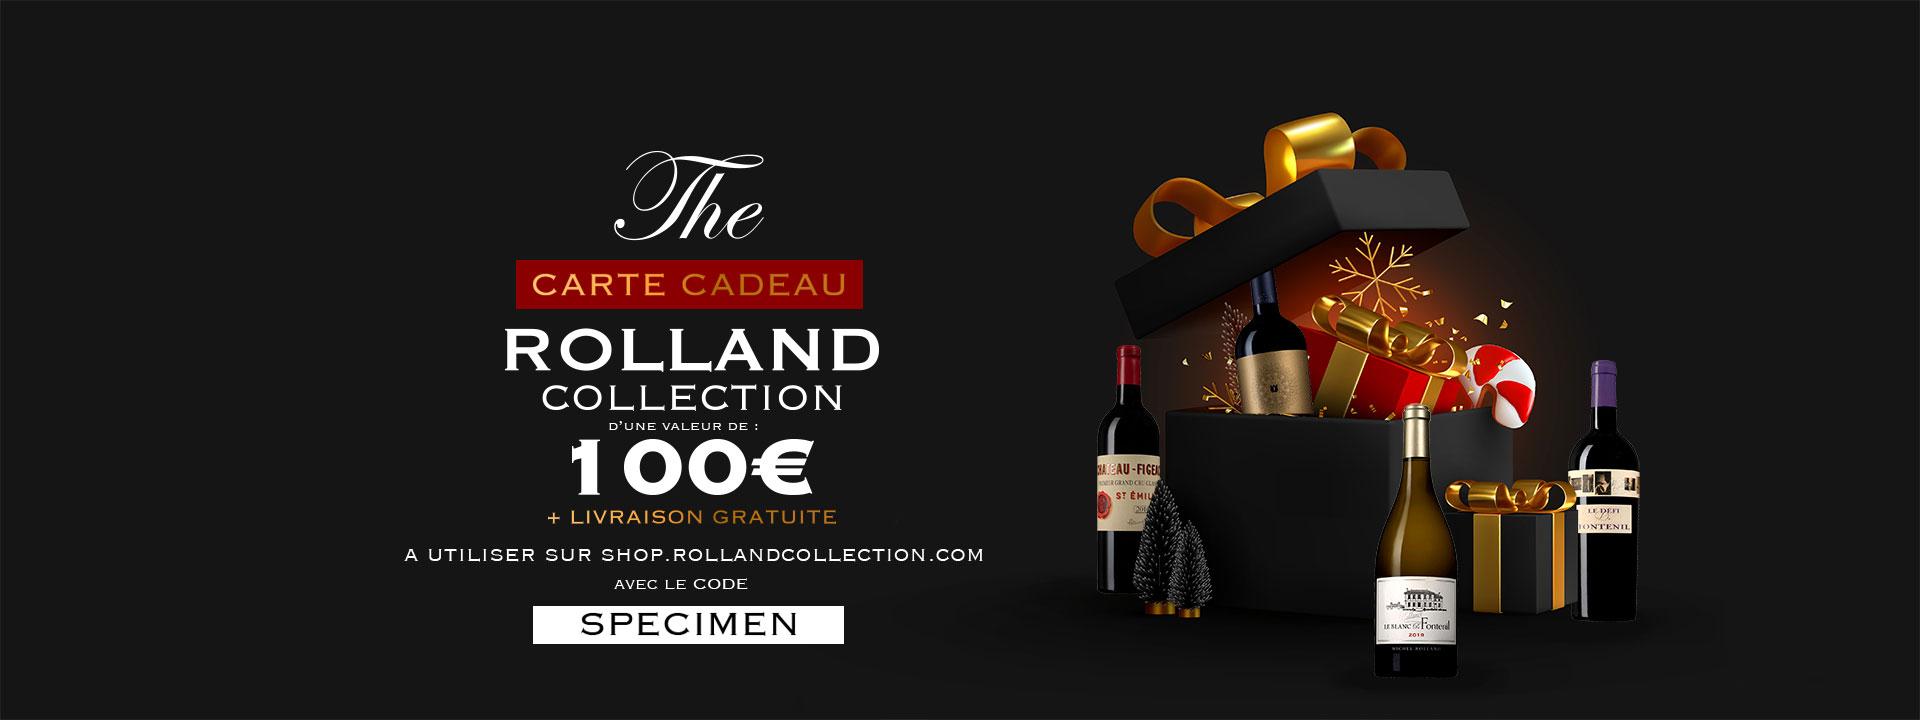 Carte Cadeau - Rolland Collection